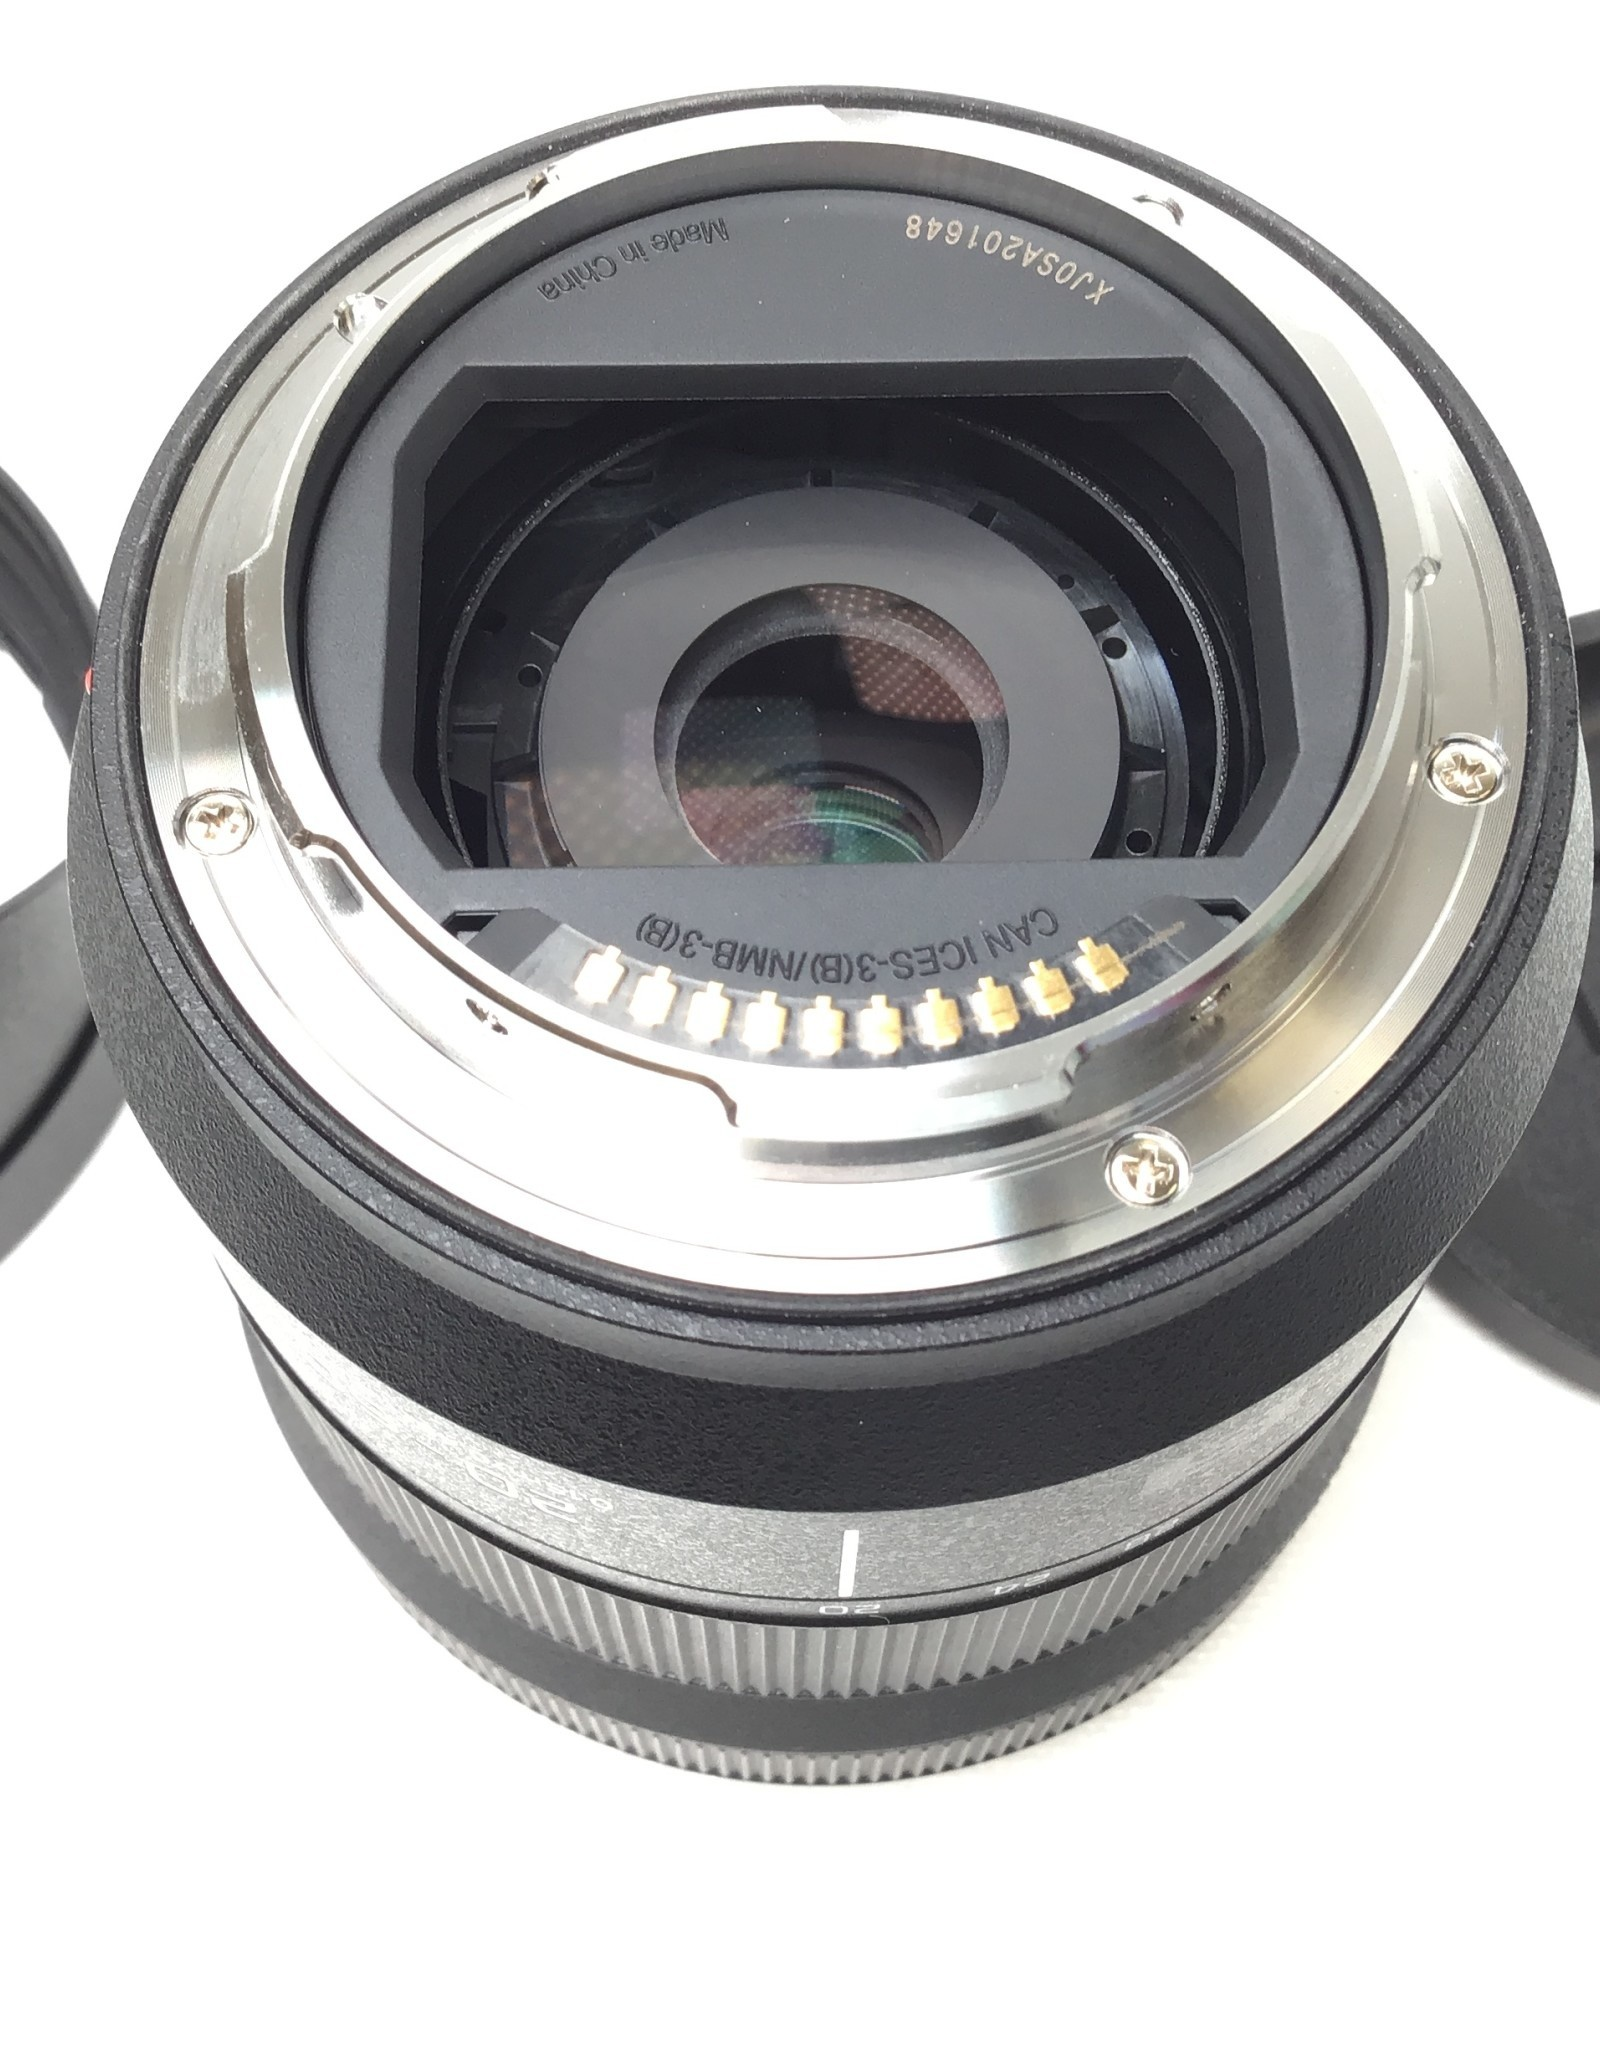 PANASONIC Panasonic S 20-60mm f3.5-5.6 Lens Used EX